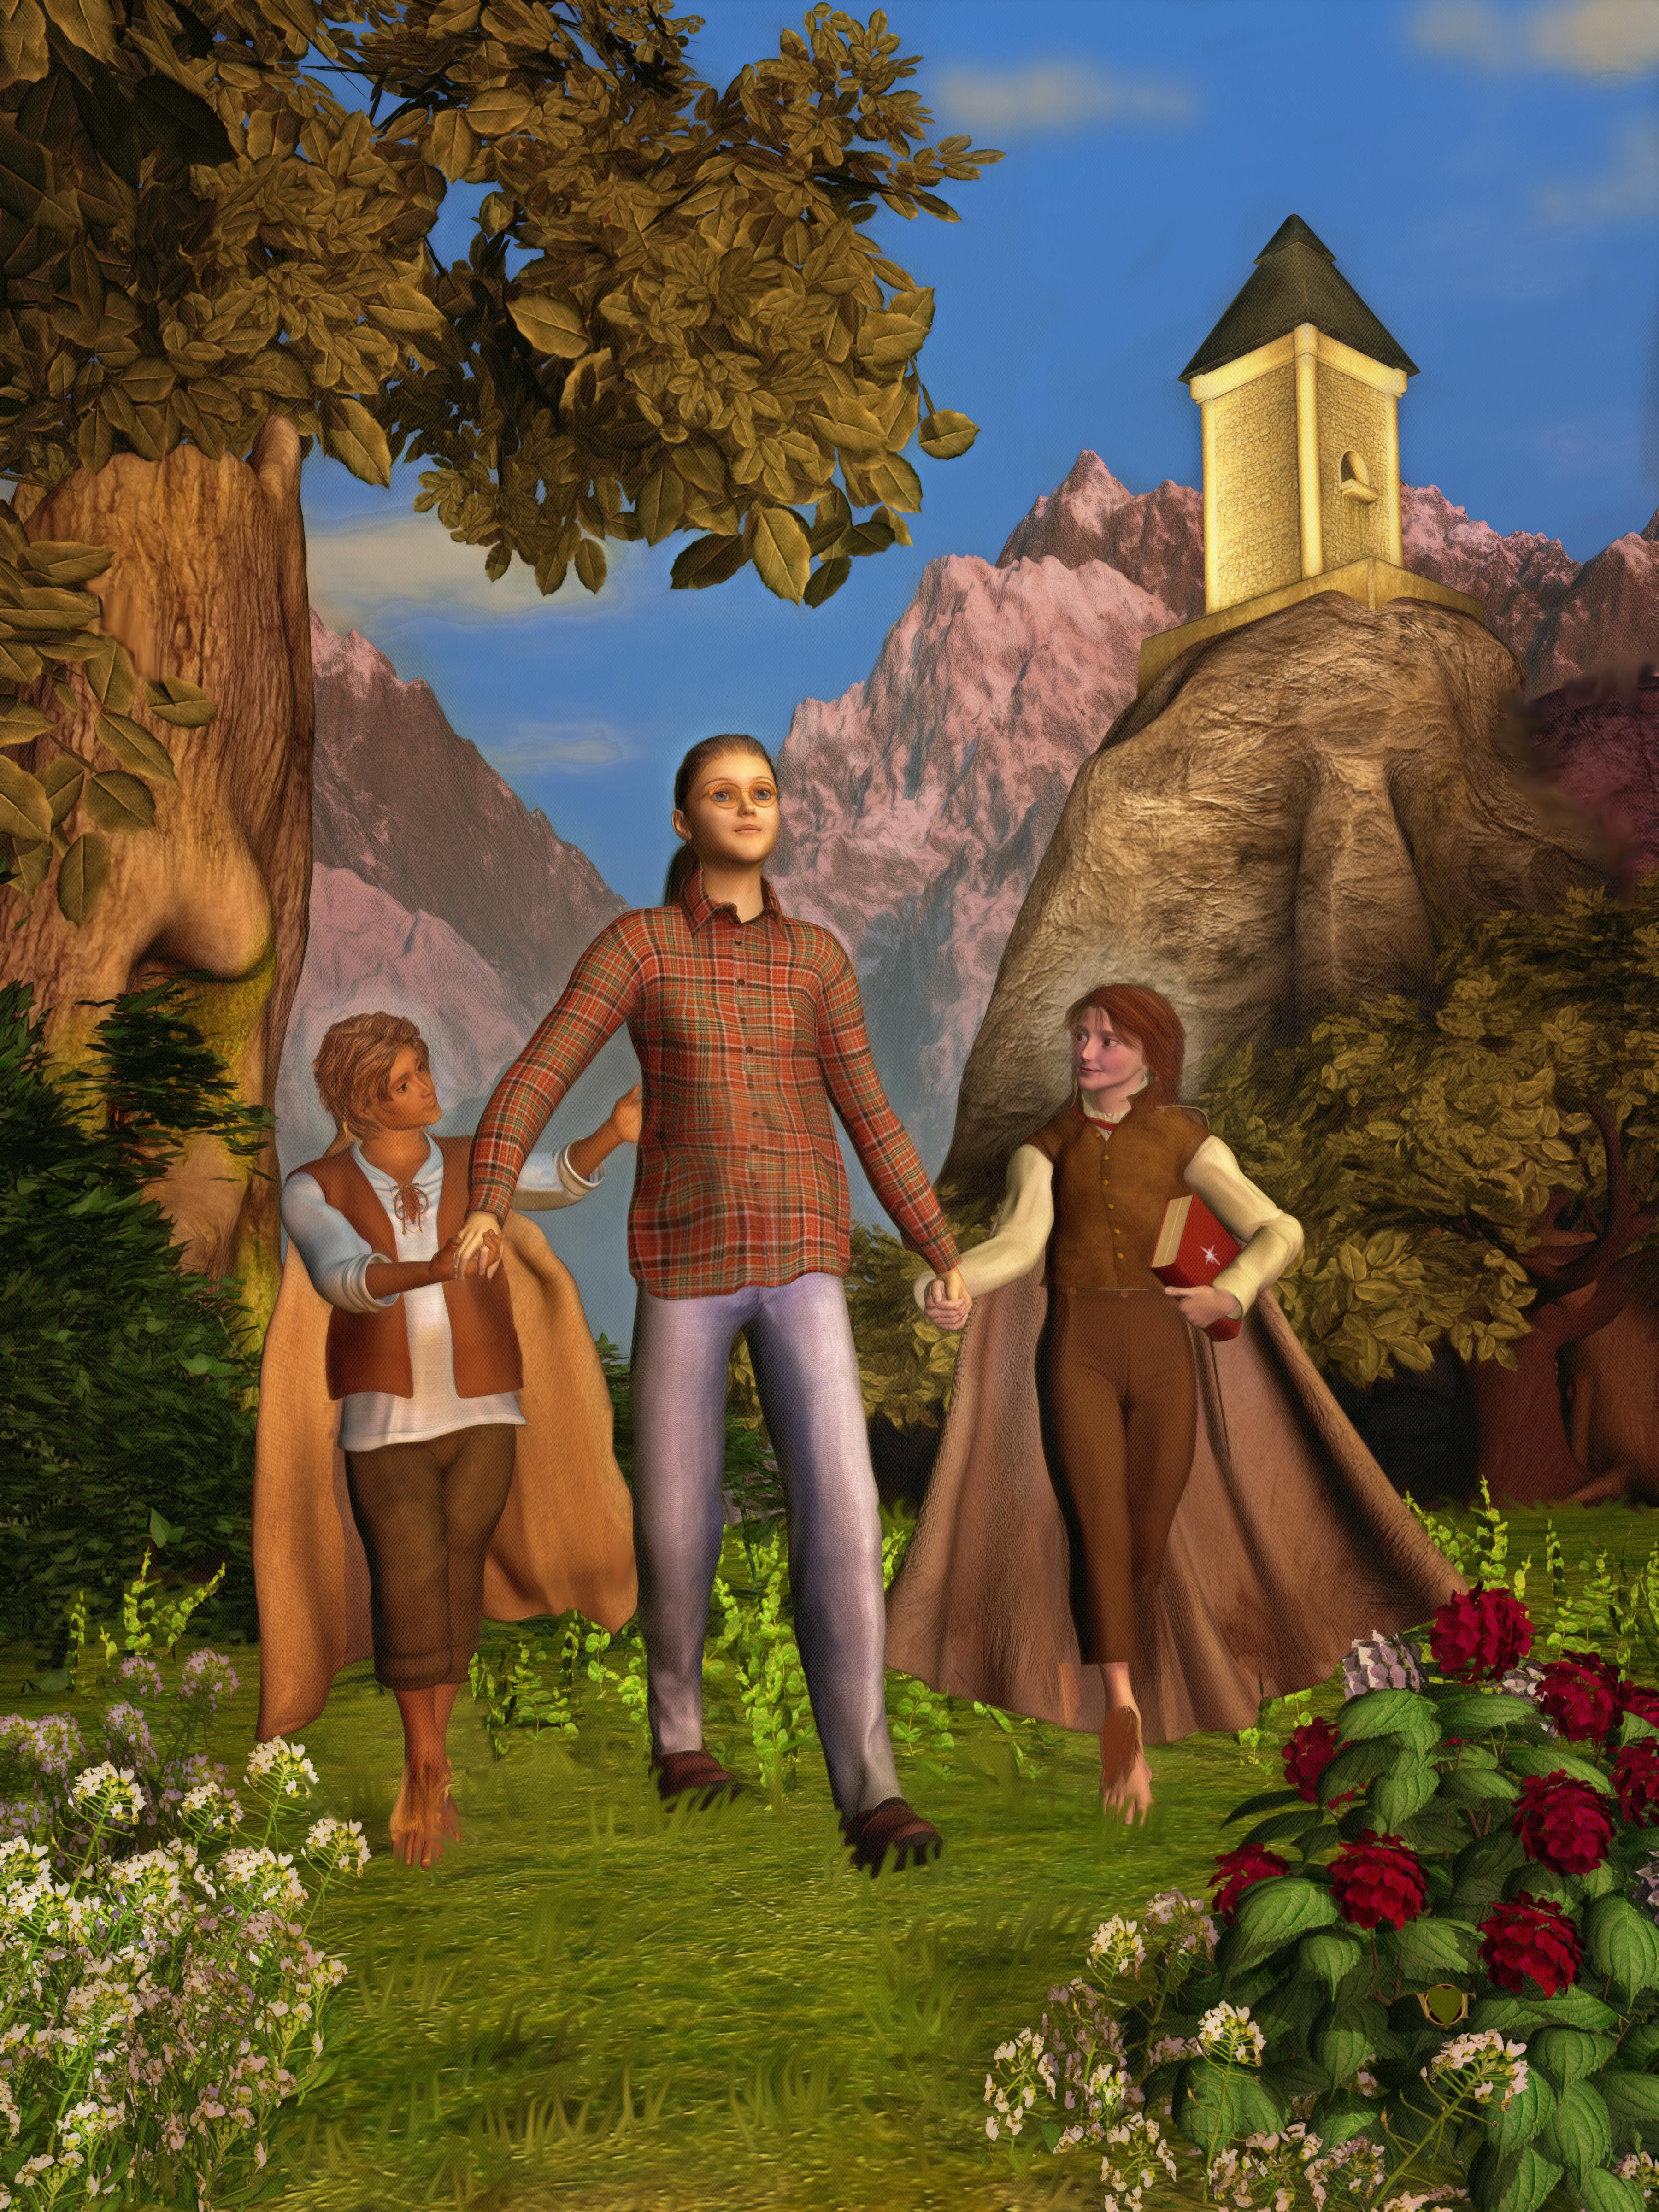 A walk through Middle Earth